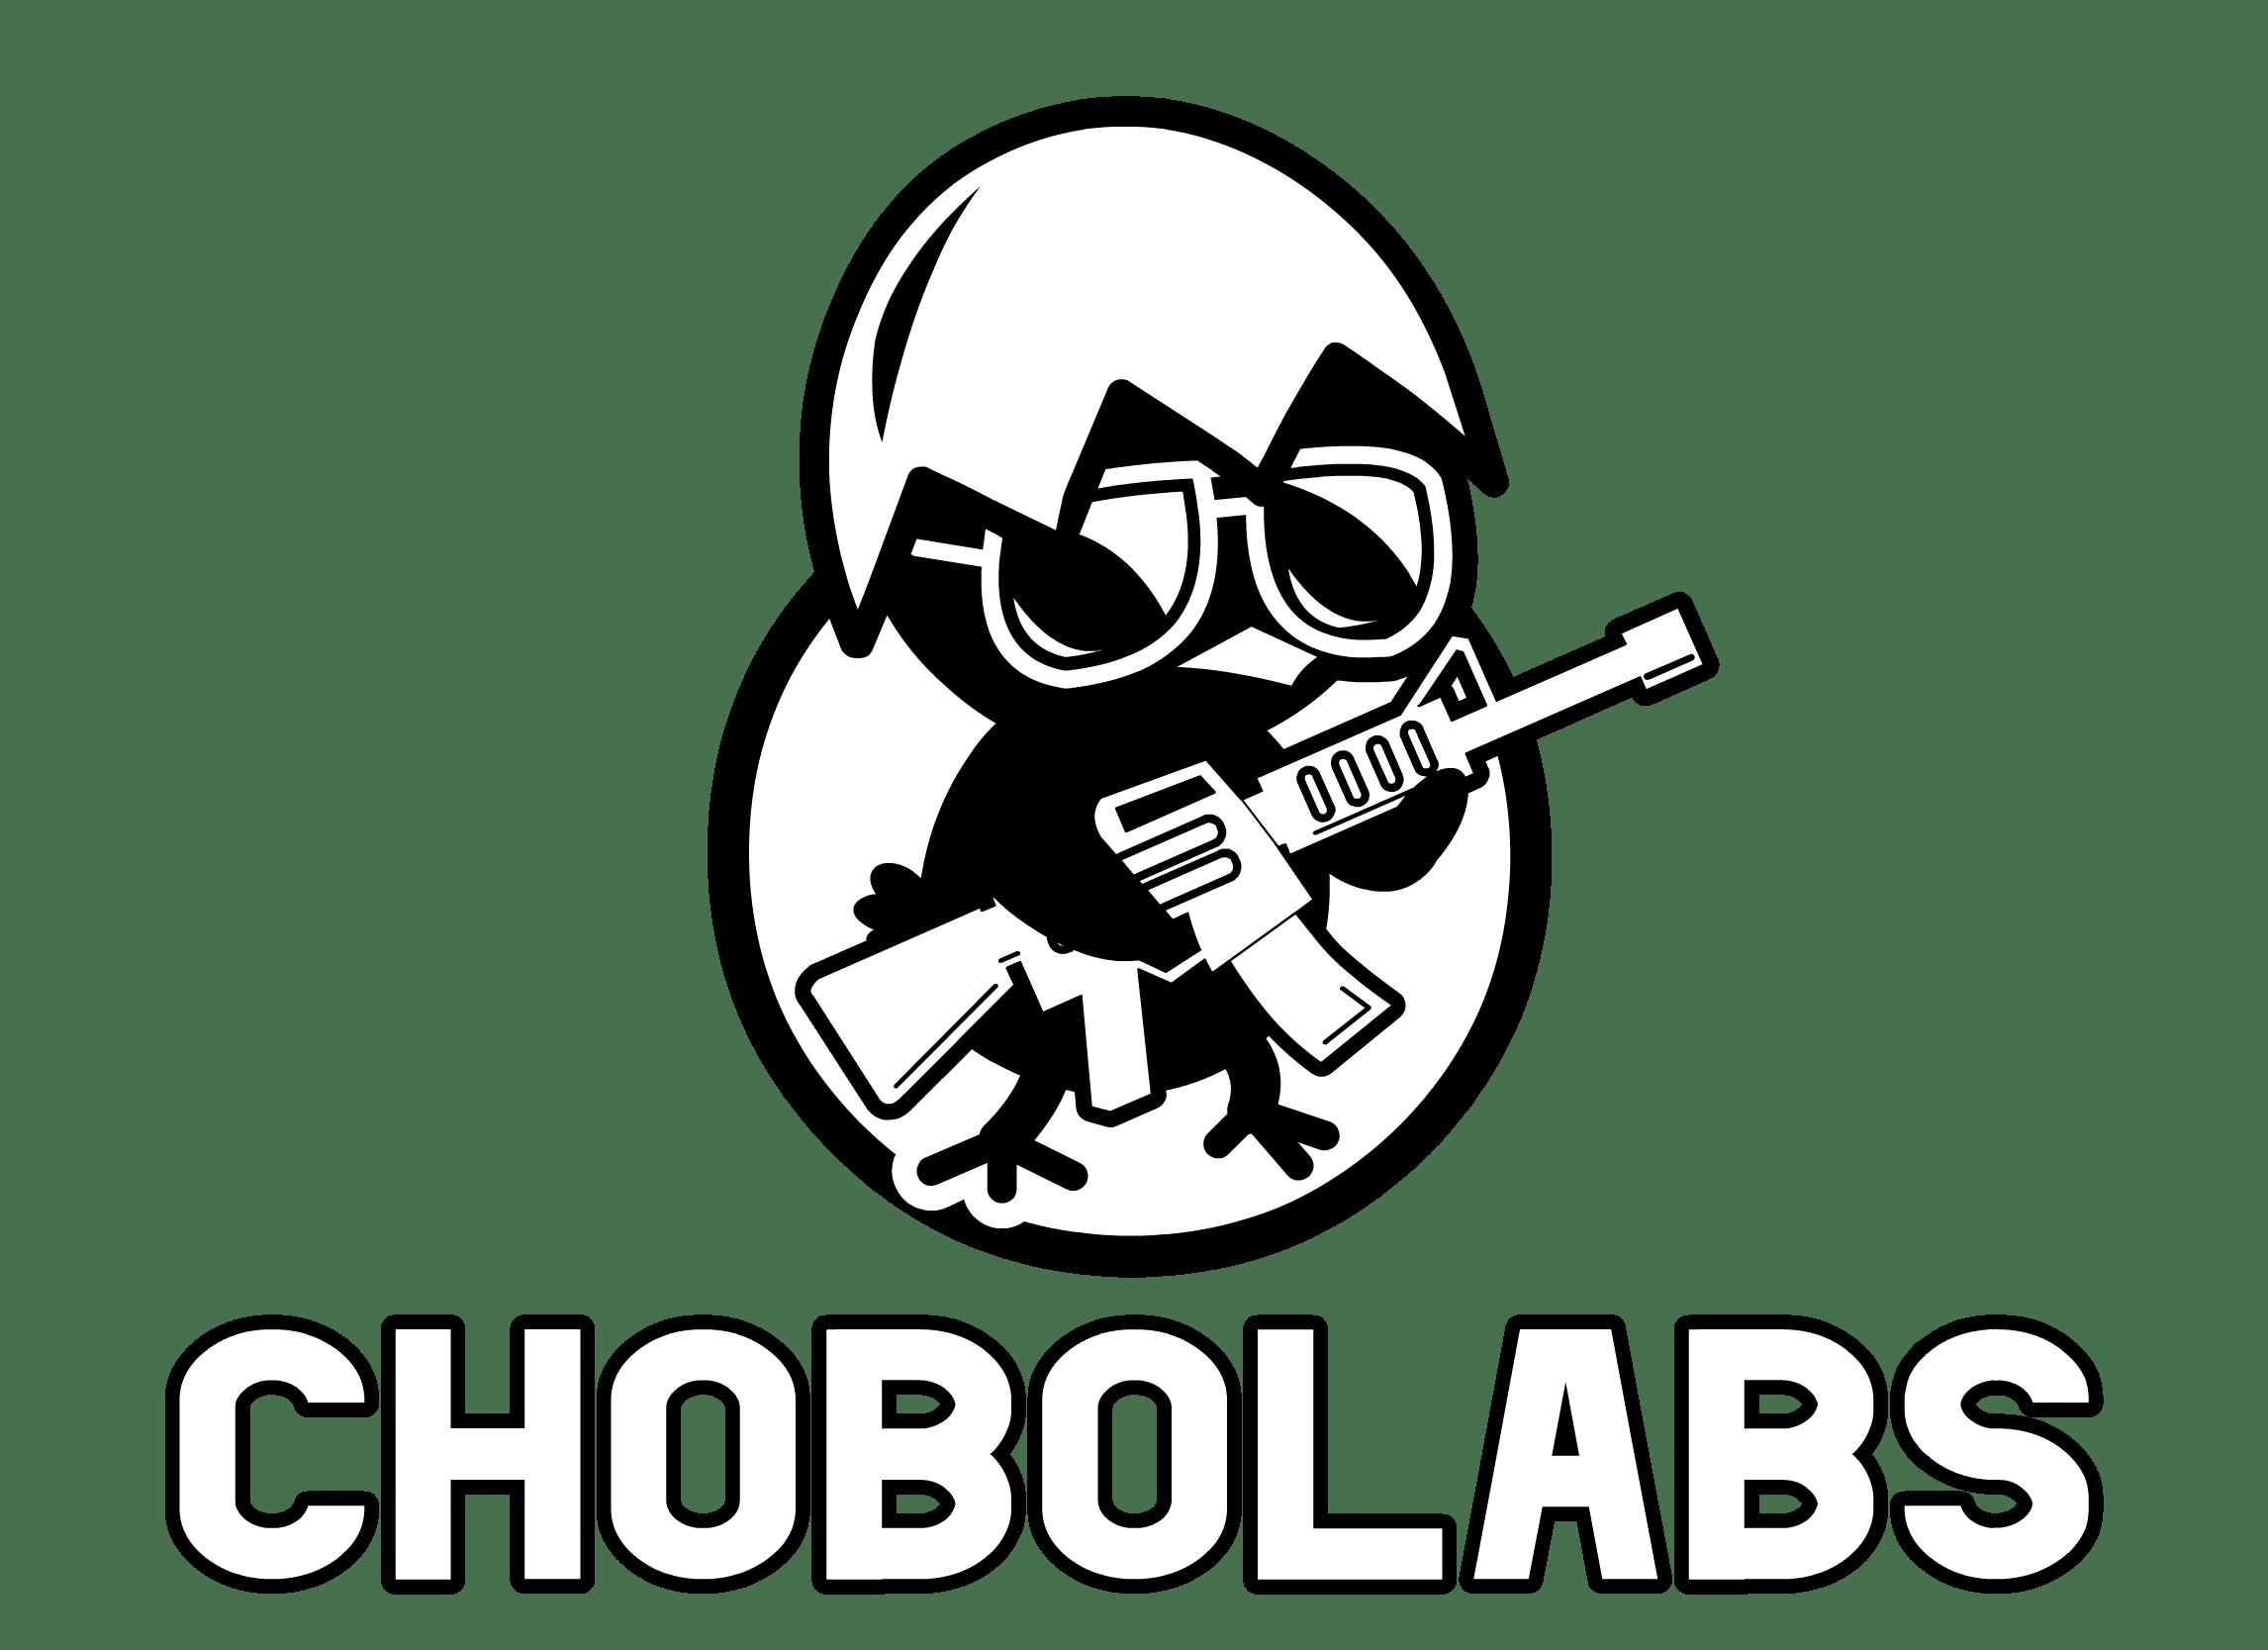 Chobolabs